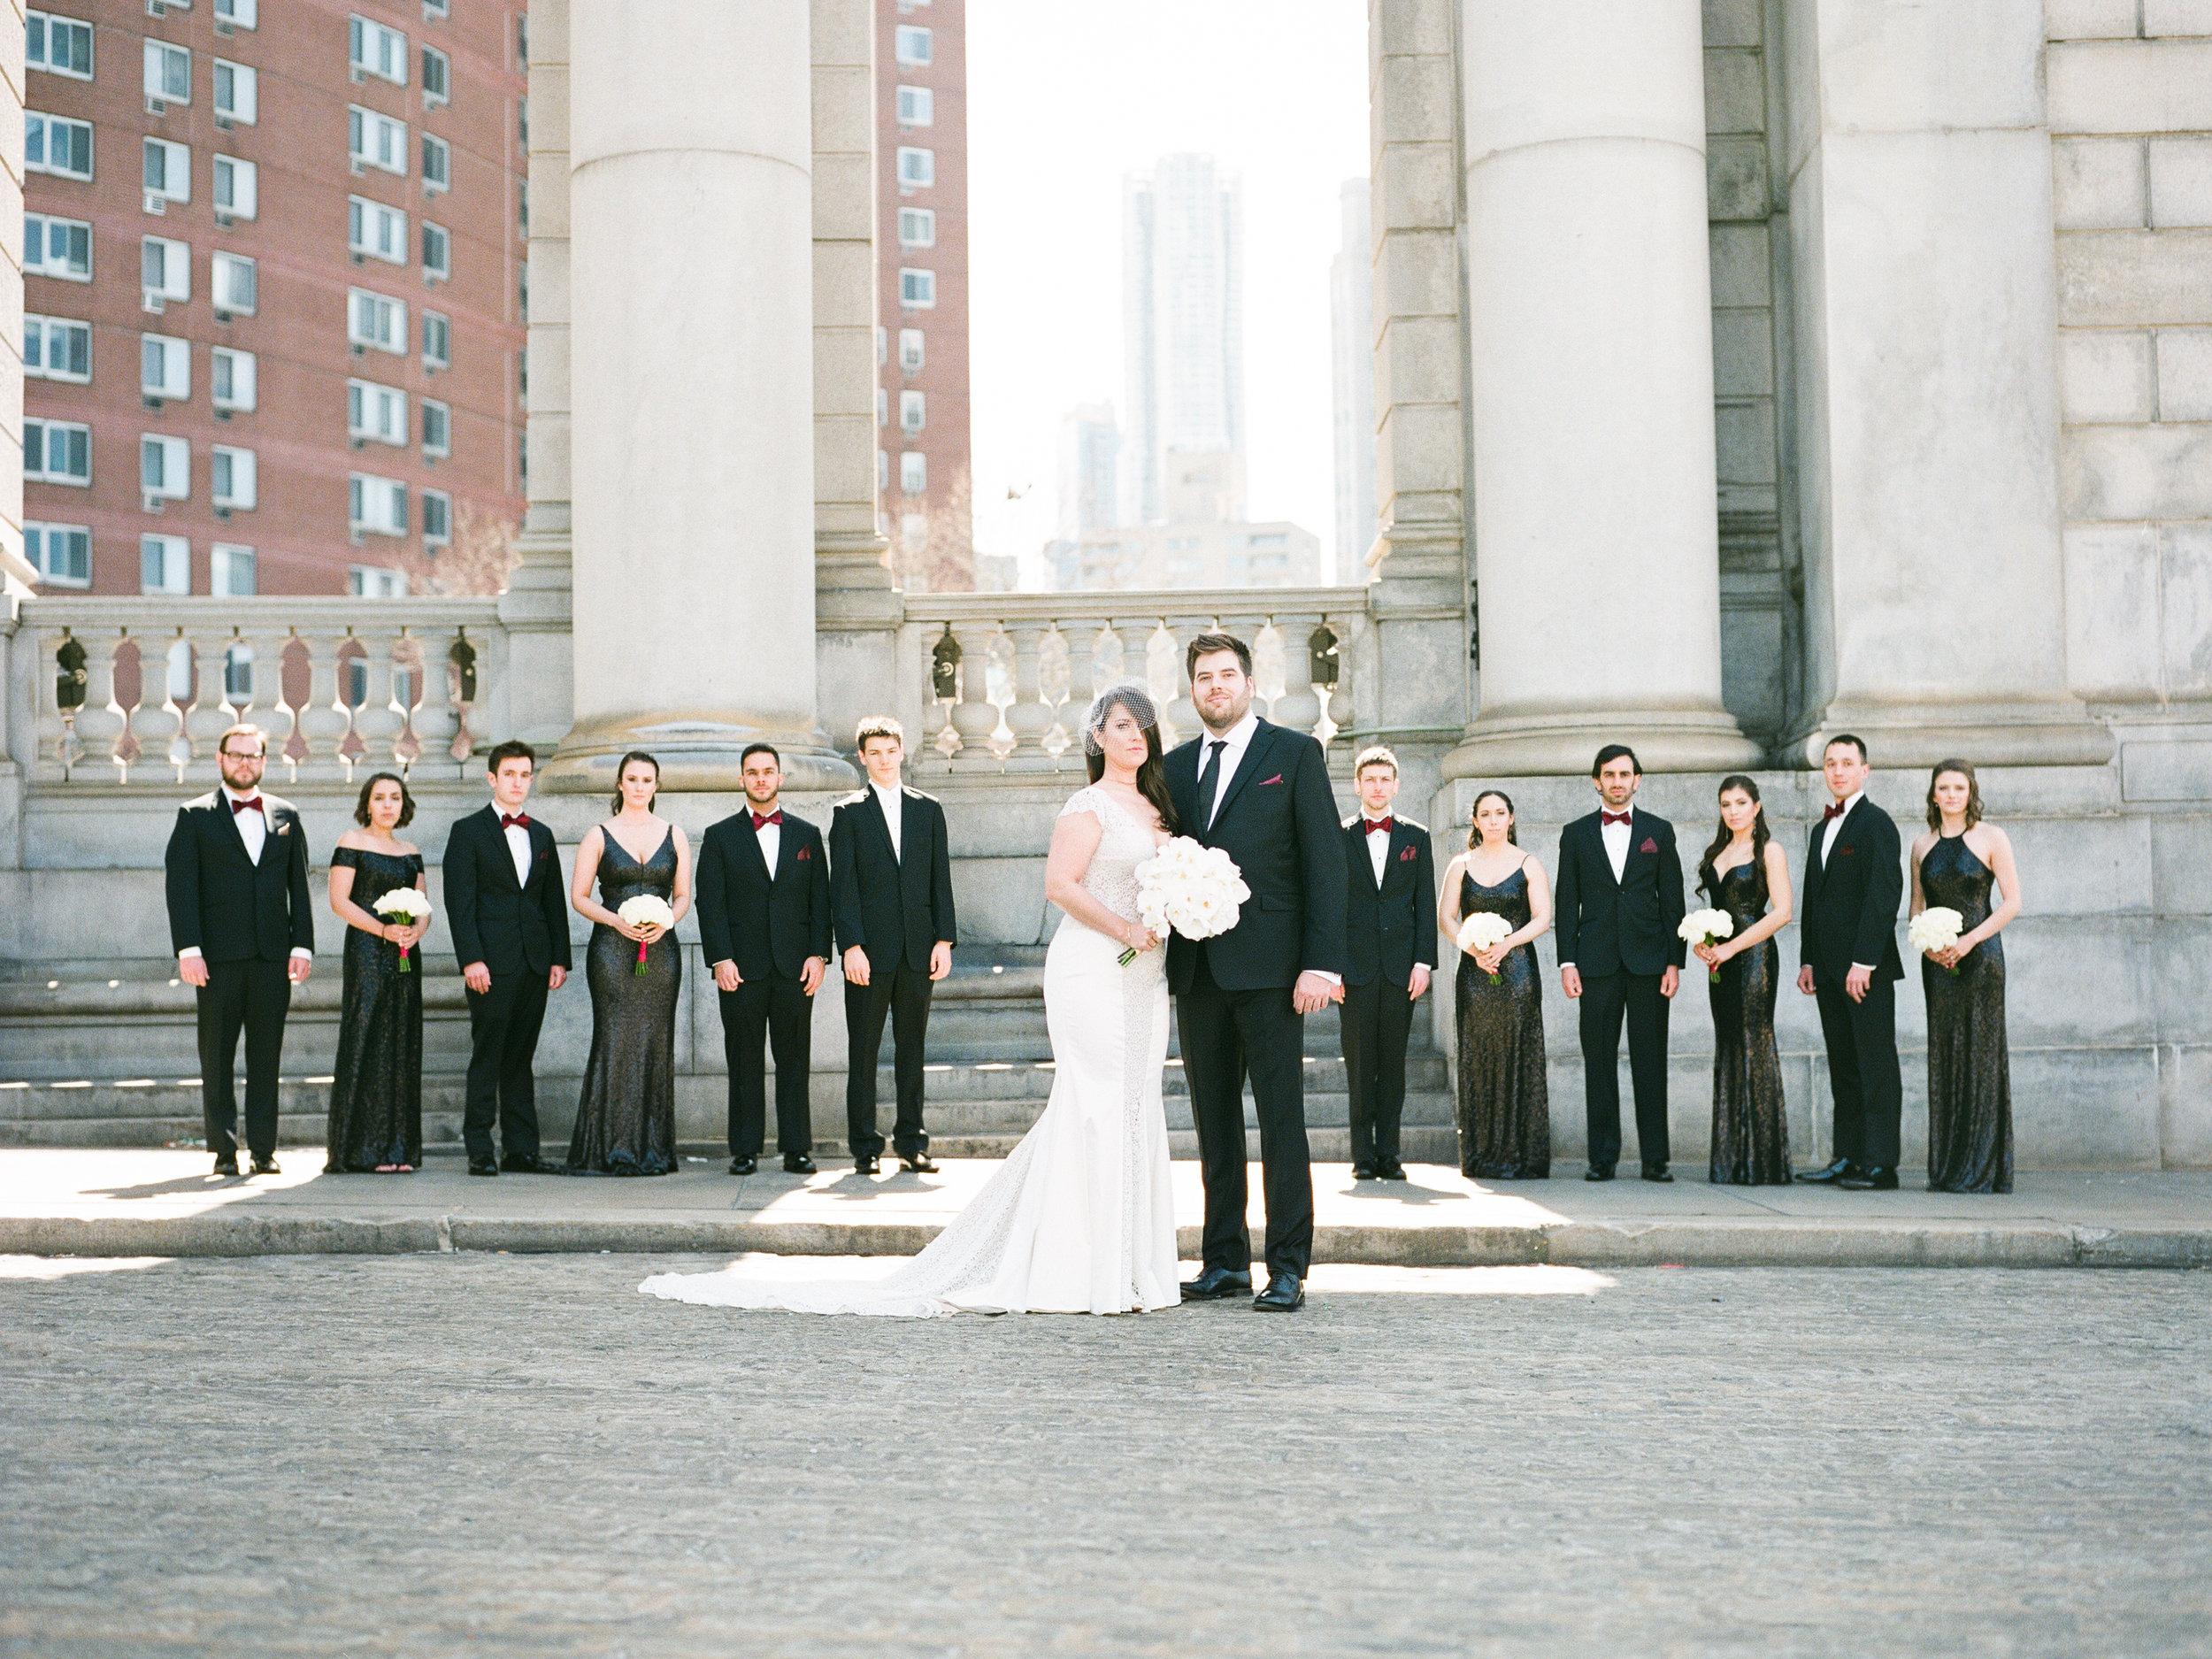 Claire+James_MediumFormat_Wedding_PRINT-17.jpg